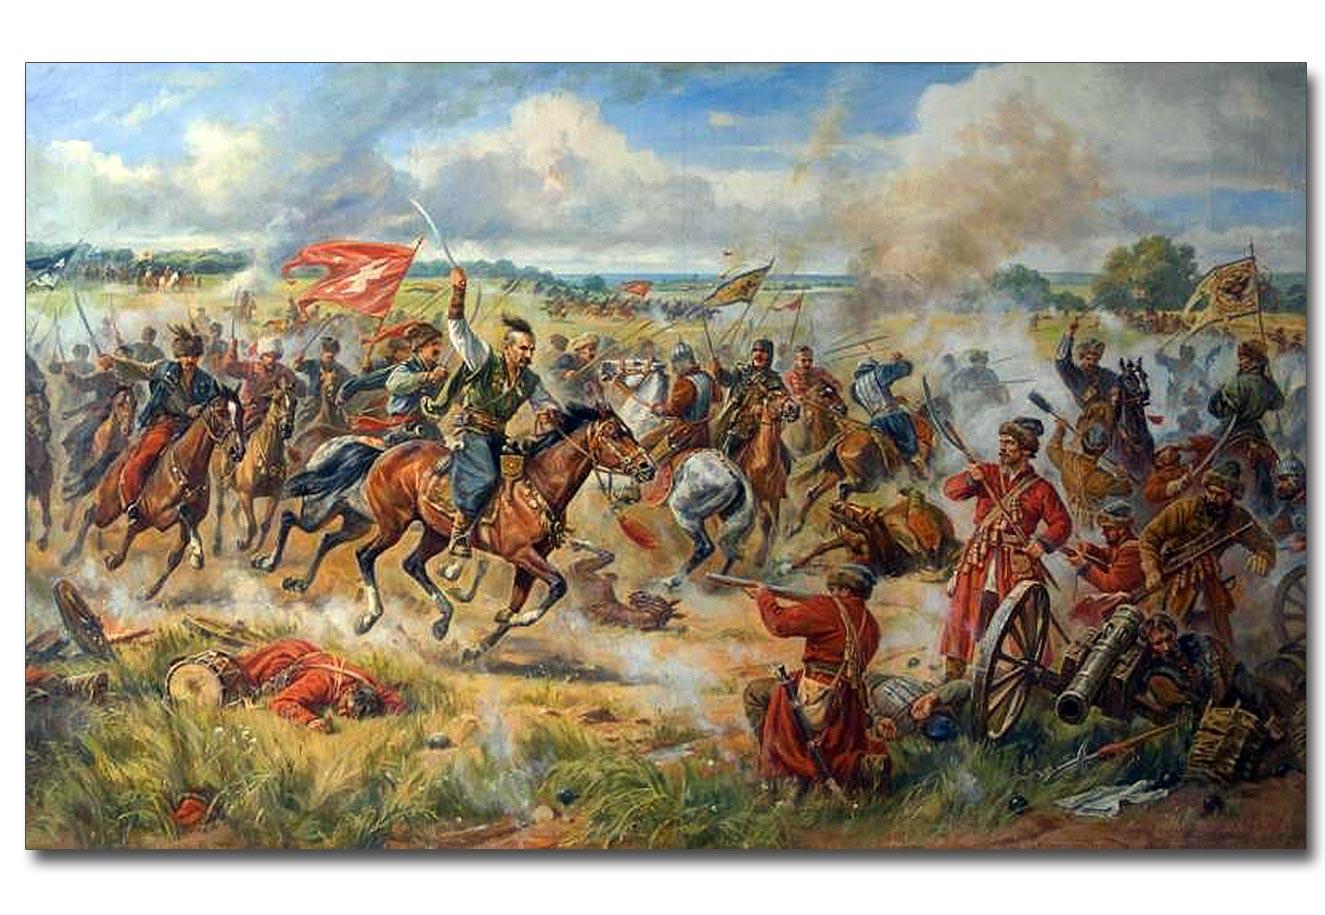 Dzieło Artura Orlenowa. Bitwa pod Konotopem. 2008 rok